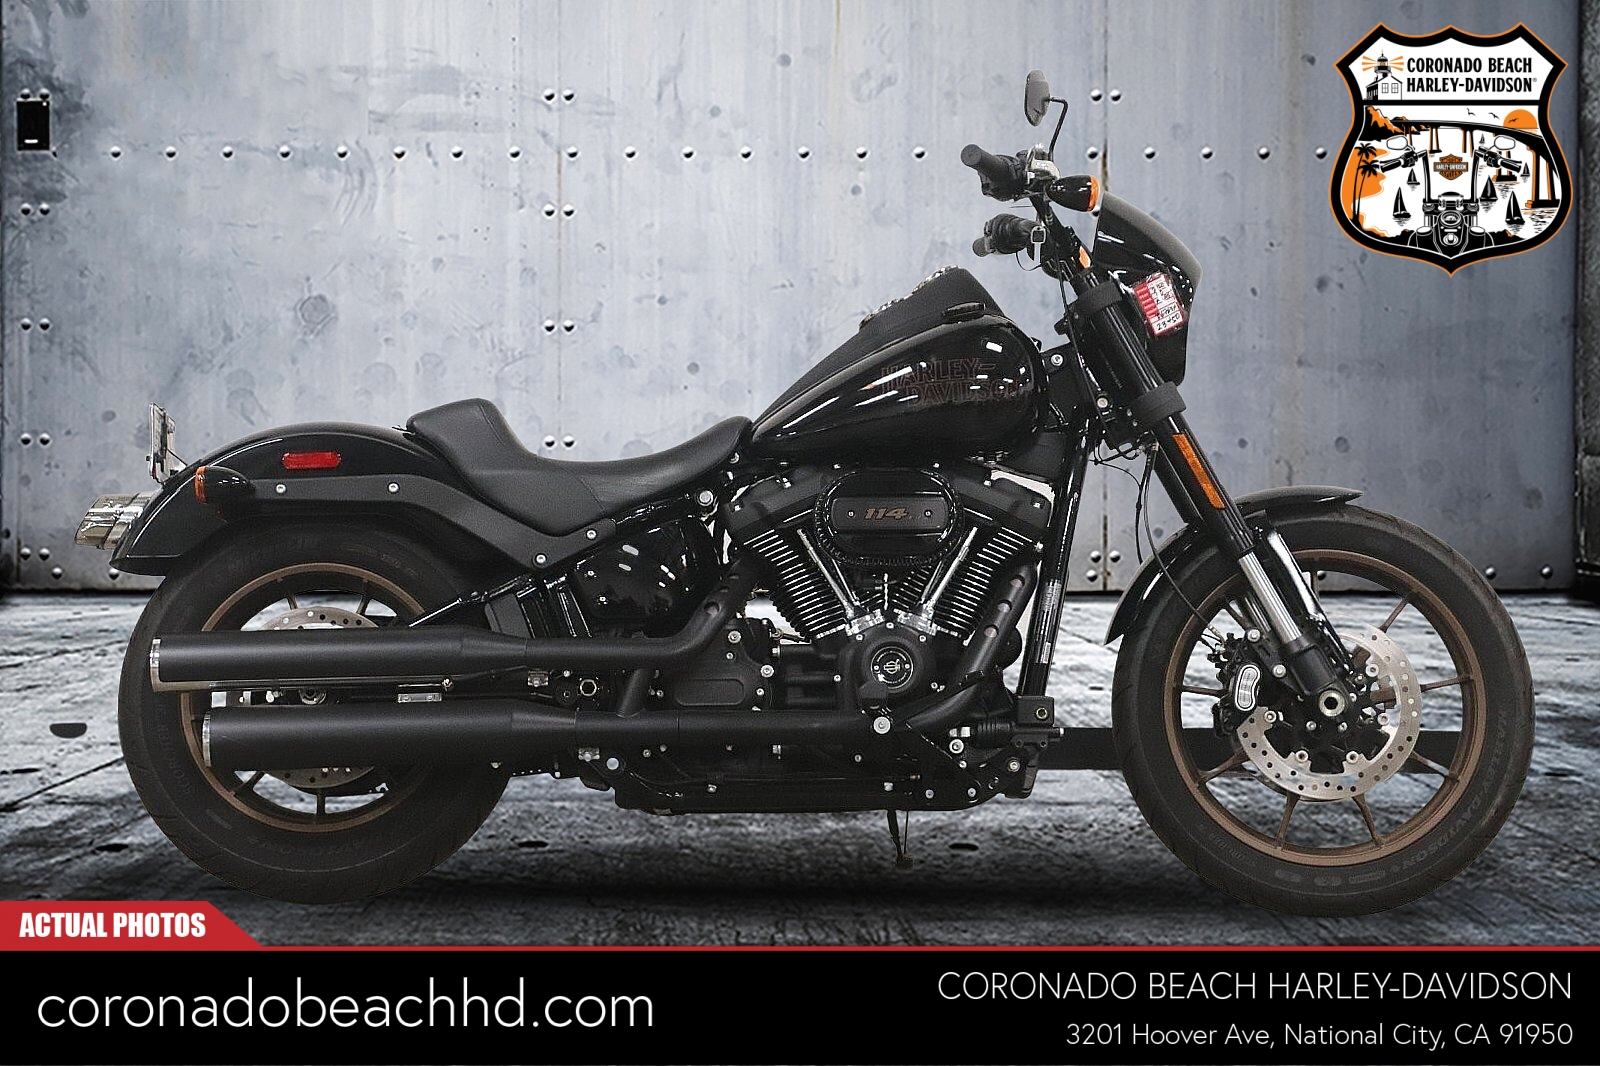 2020 Harley-Davidson Low Rider S [89]